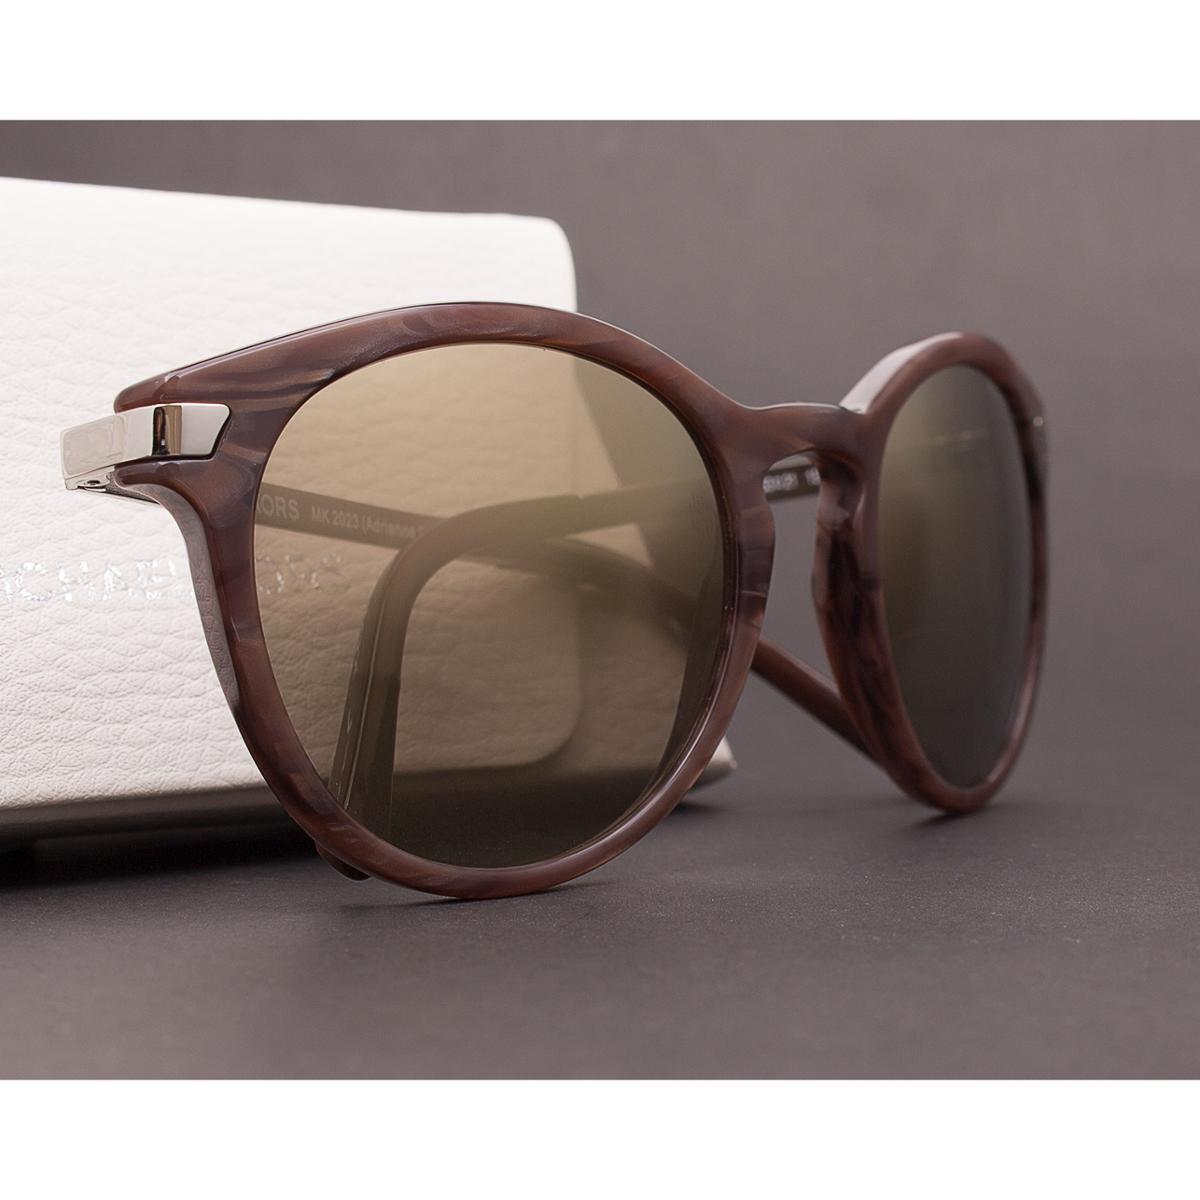 b76736353b733 Óculos Michael Kors Adrianna III MK2023 31905A 53 - Compre Agora   Netshoes